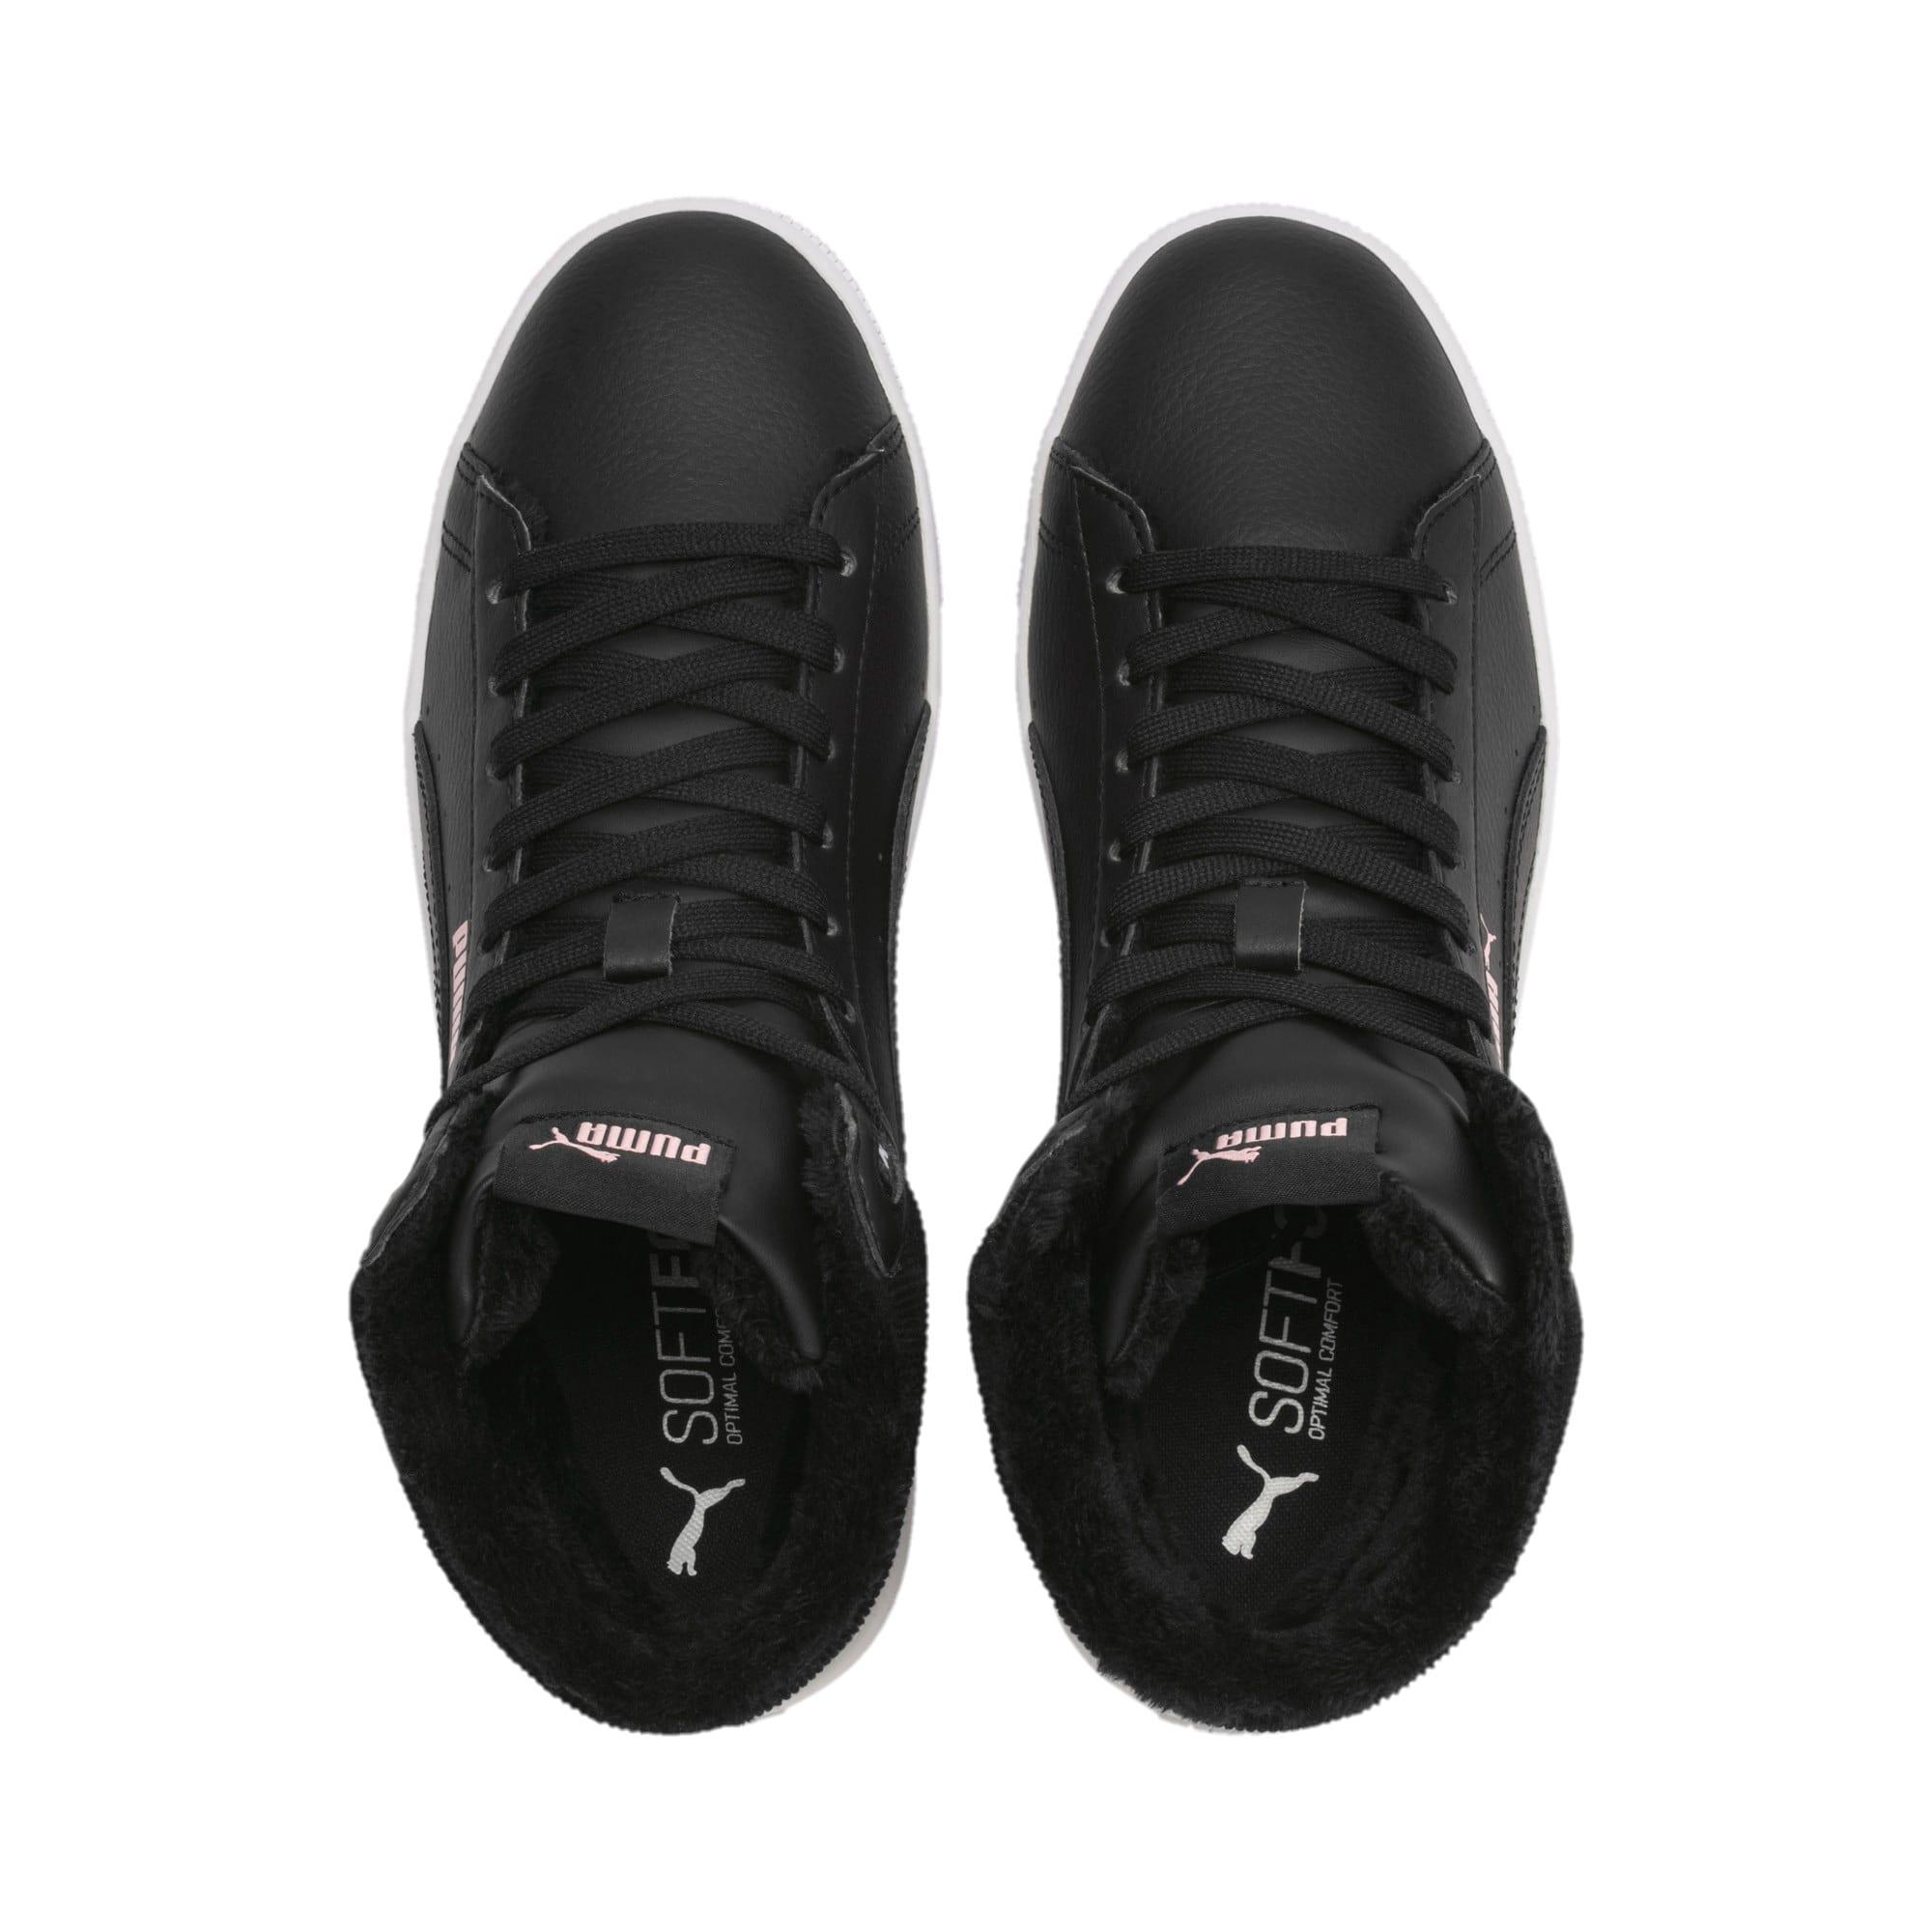 Thumbnail 7 of Vikky v2 mittelhoher Damen Winter Sneaker, Puma Black-Bridal Rose-White, medium